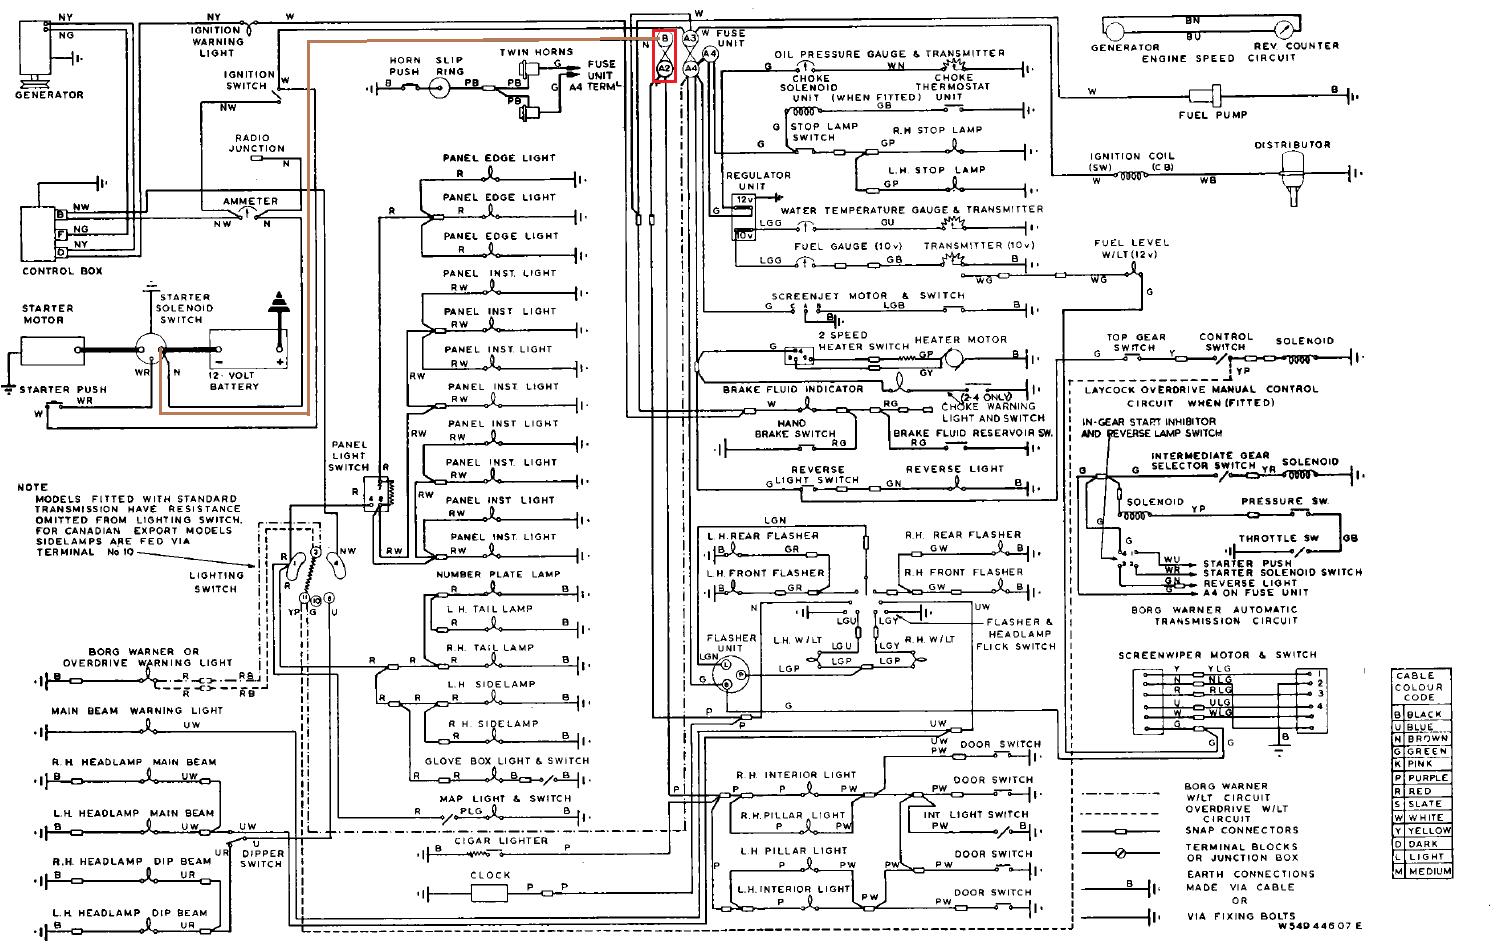 Wiring Diagram For Opel Monza Electrical Diagrams Fuse Box 1984 Manta